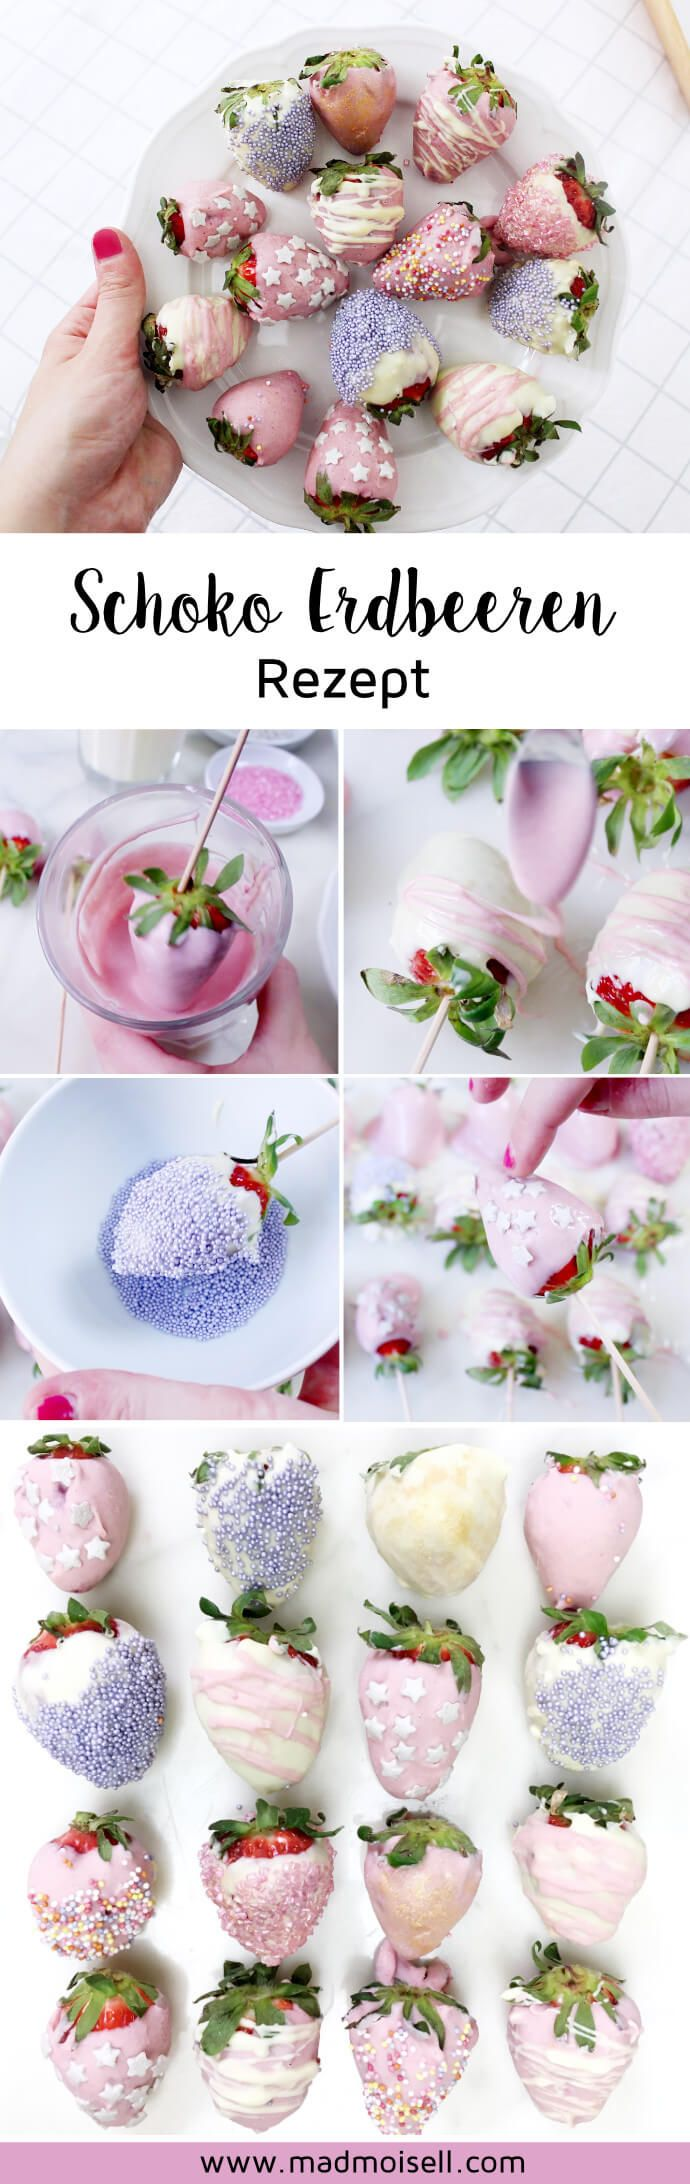 Schoko Erdbeeren selber machen: Super einfaches Rezept! #sweetrecipes